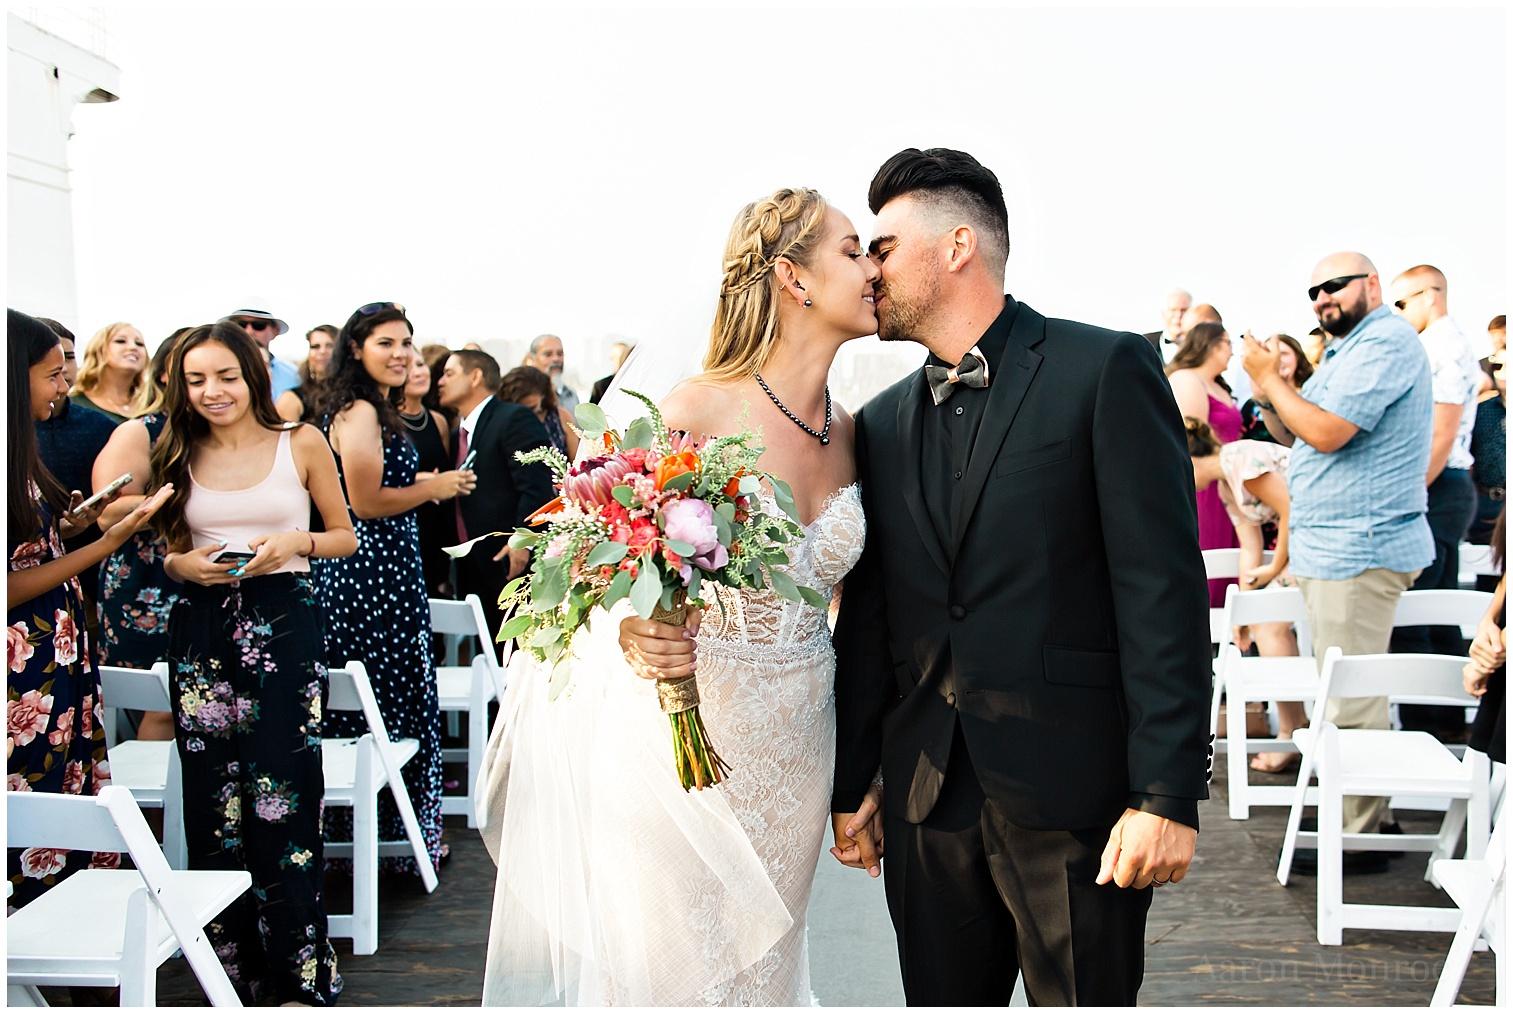 Queen_Mary_Long_Beach_Wedding_Photography_0478.jpg